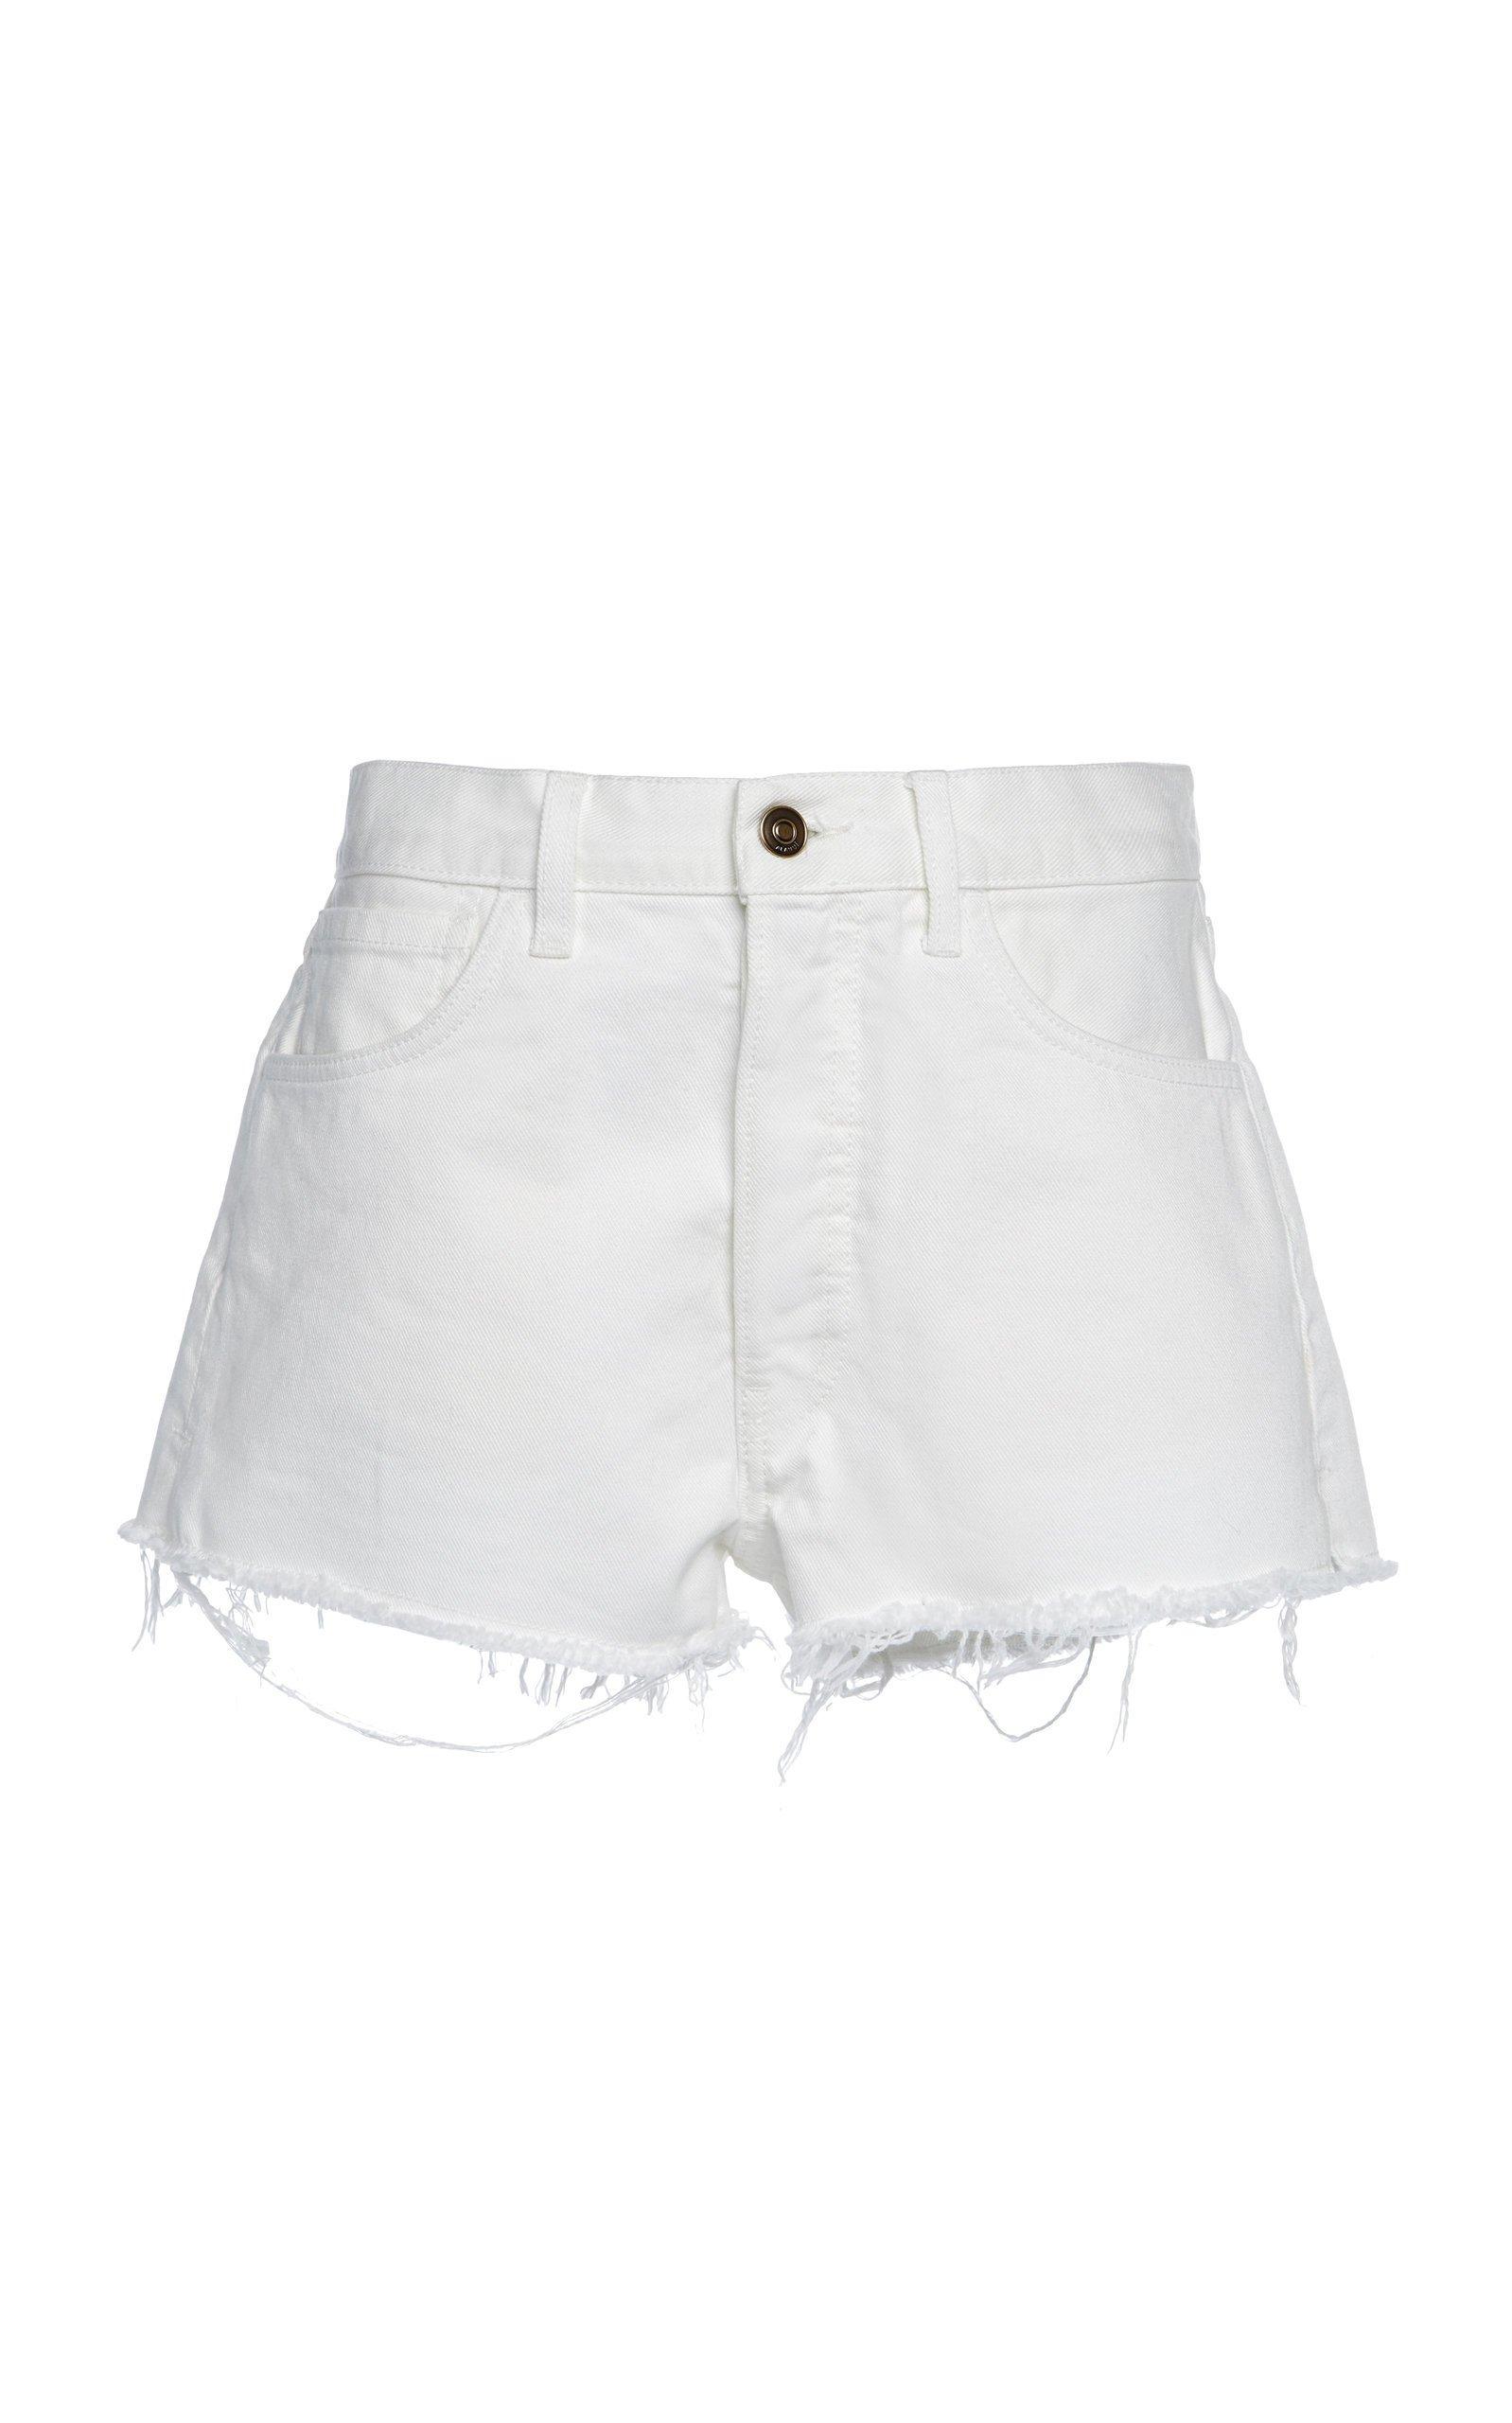 Alanui High-Rise Denim Shorts Size: 25